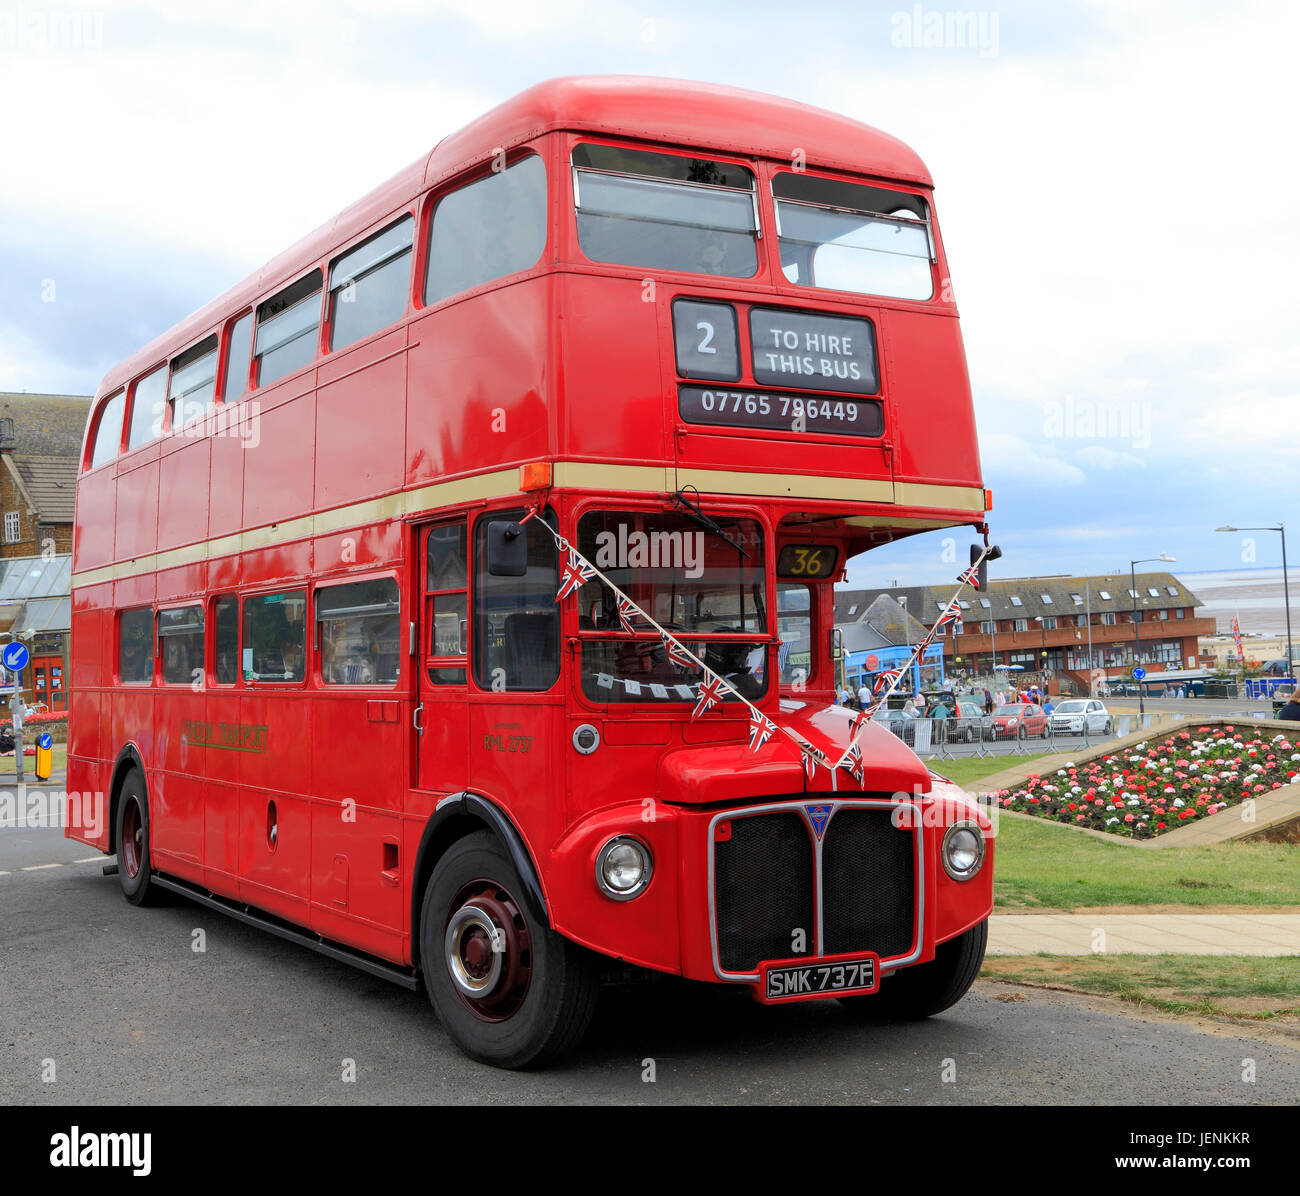 vintage, red, London Transport bus, Hunstanton, Norfolk, England, UK, tourist attraction - Stock Image